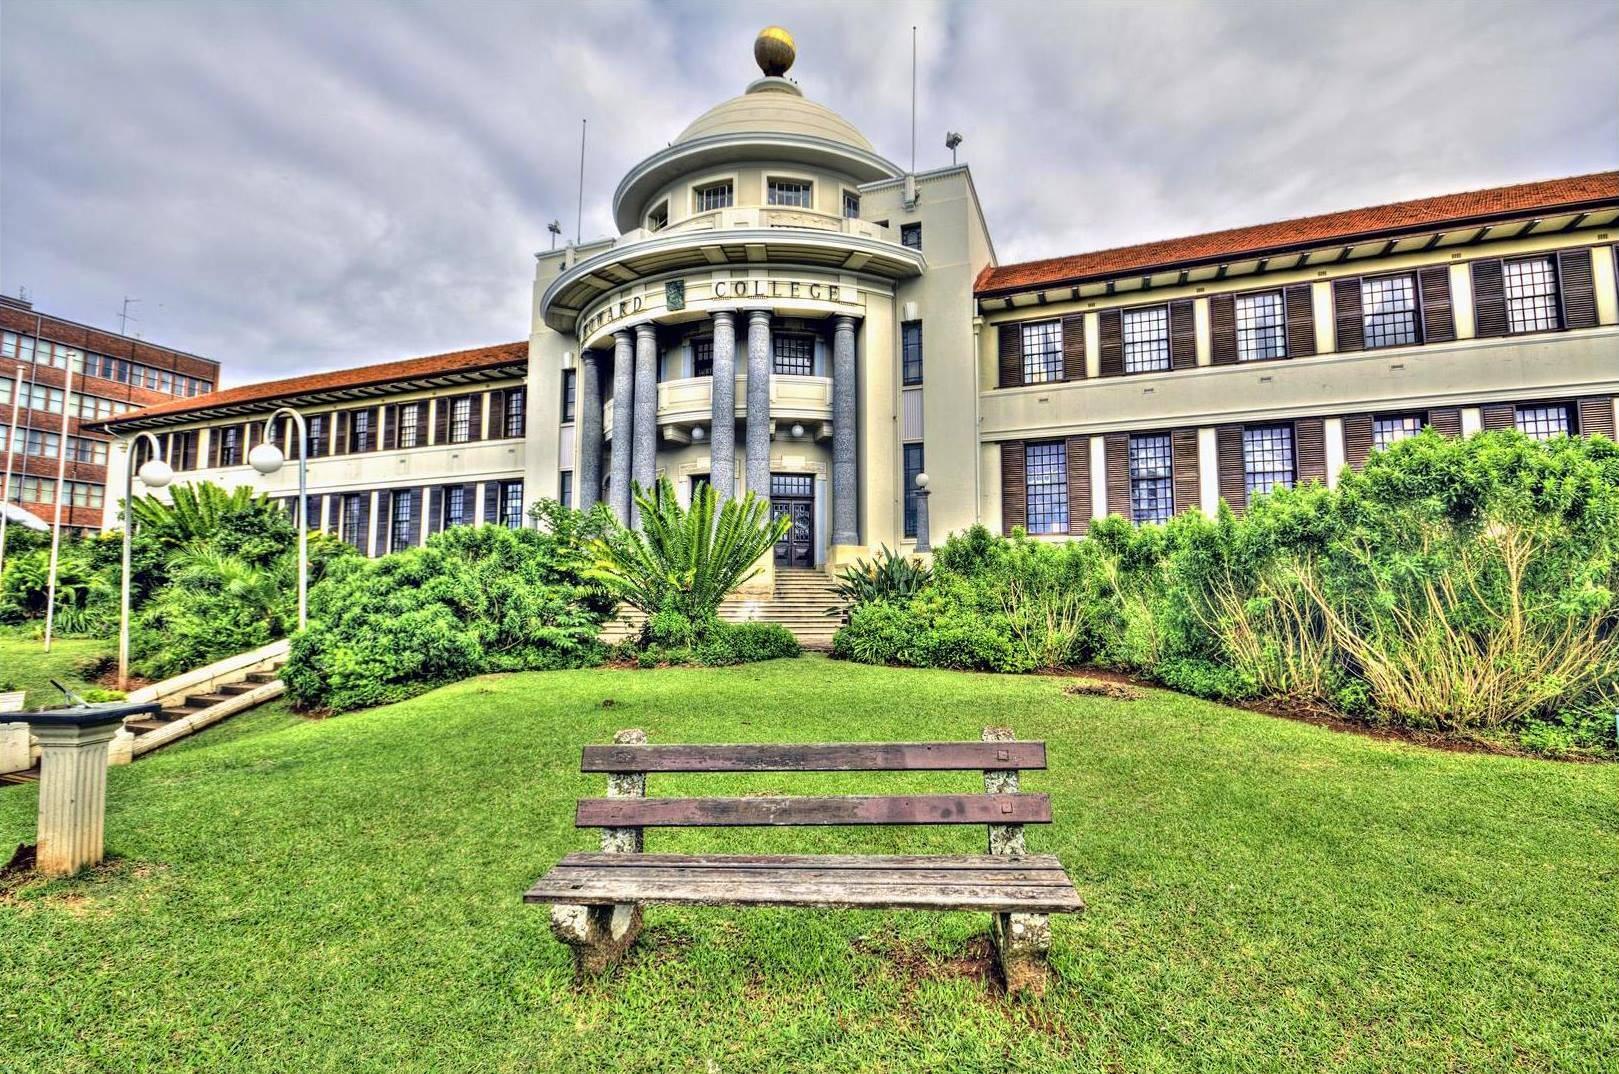 The University of KwaZulu-Natal's Howard College campus in Durban.